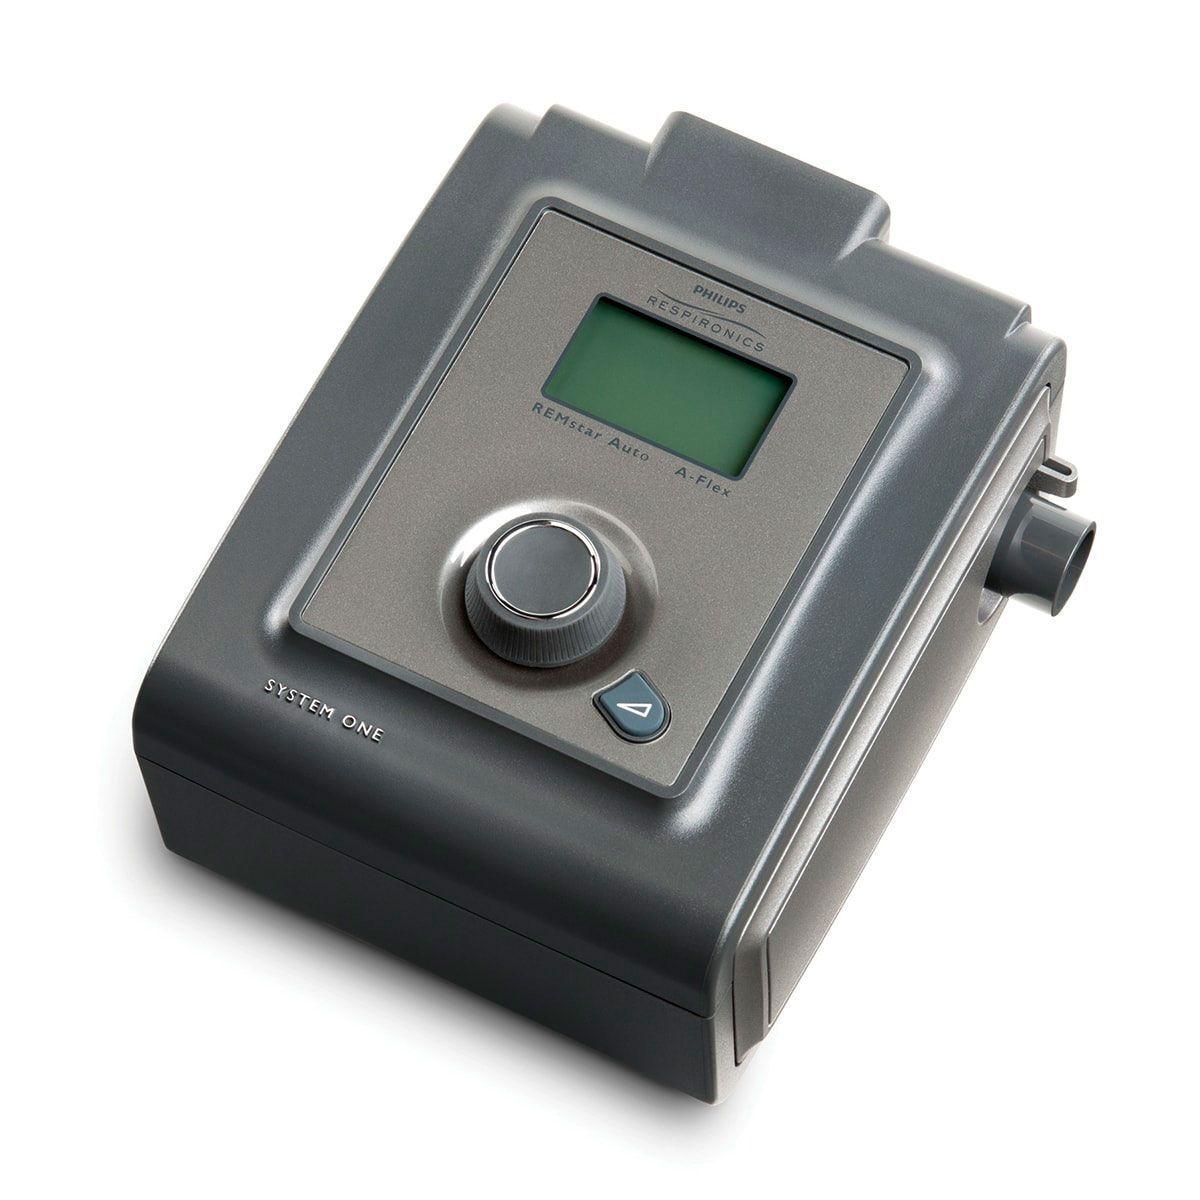 Kit CPAP Automático System One Serie 60 com Umidificador Philips Respironics